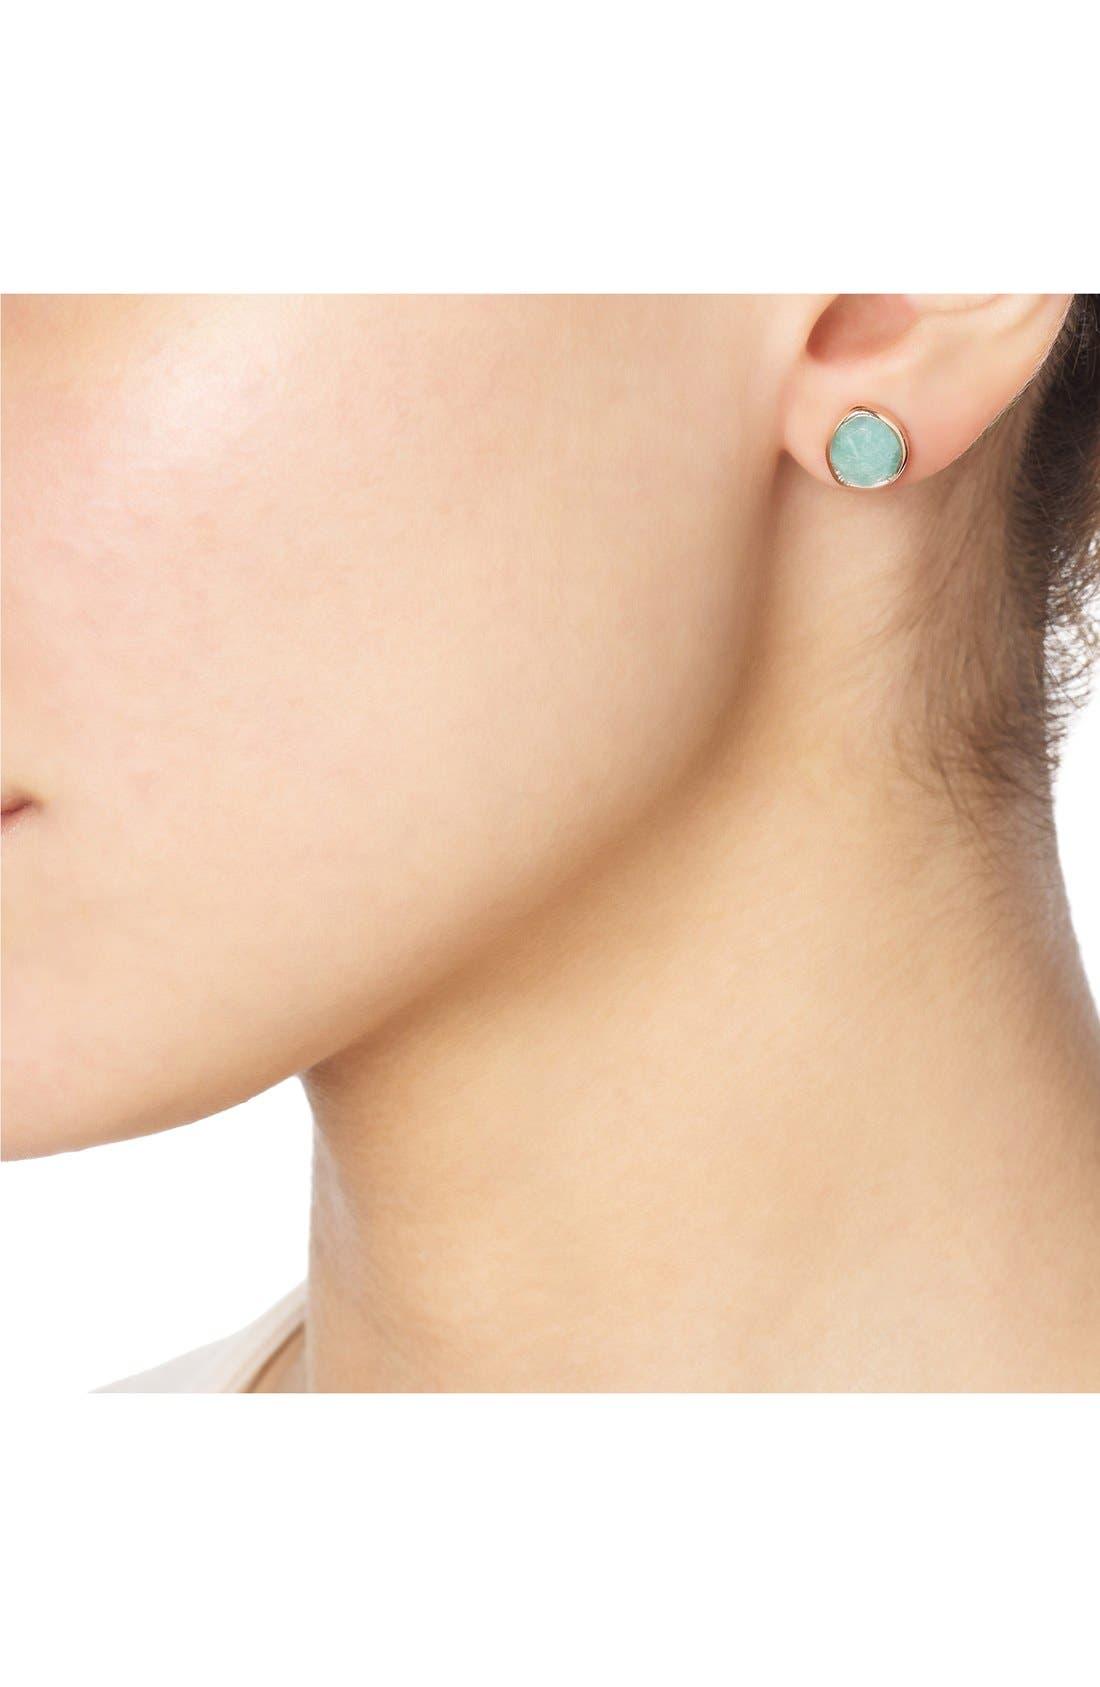 'Siren' Semiprecious Stone Stud Earrings,                             Alternate thumbnail 3, color,                             AMAZONITE/ ROSE GOLD